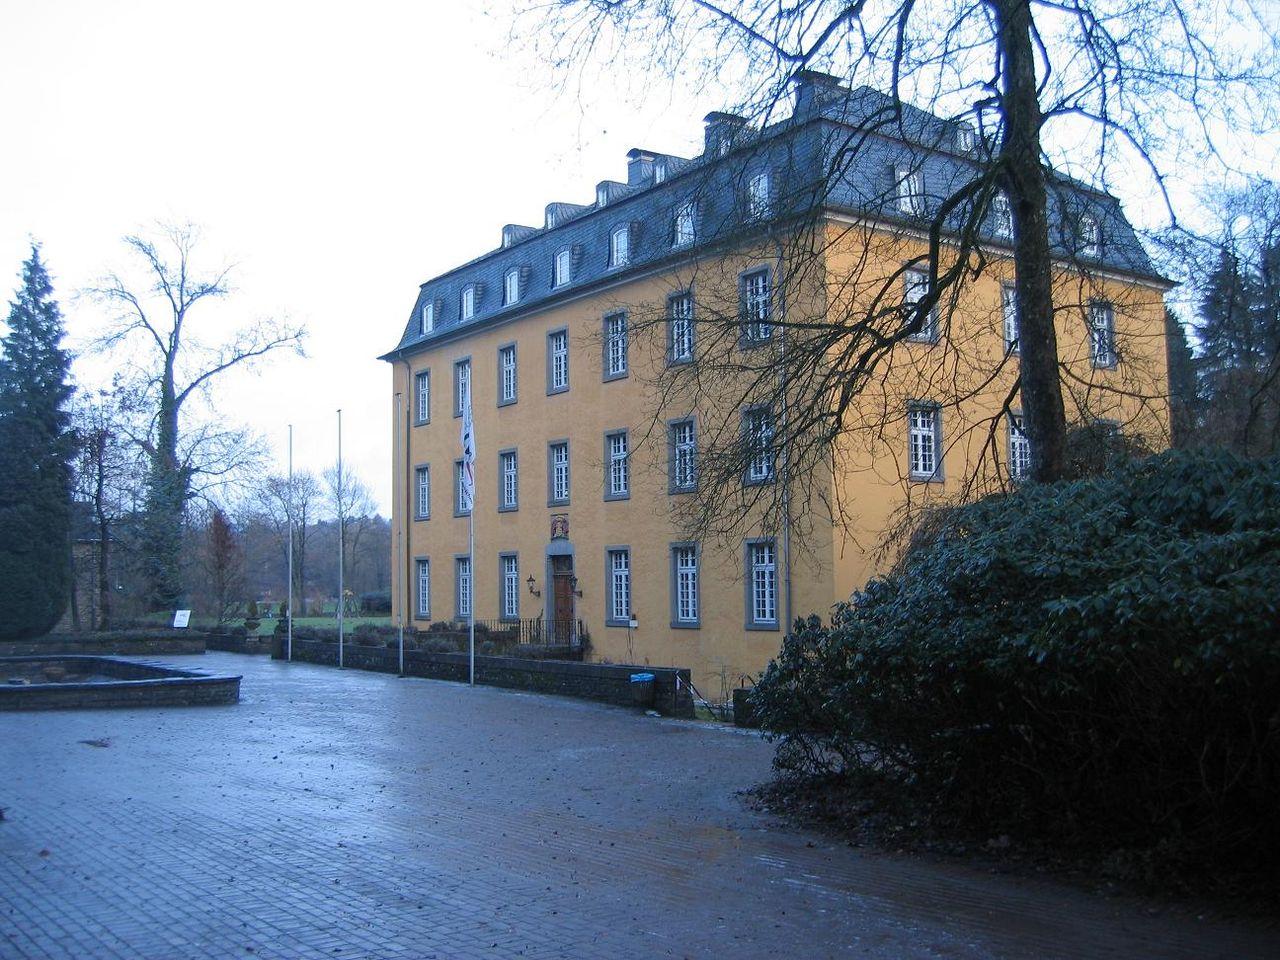 Bild Schloss Heiligenhoven Lindlar